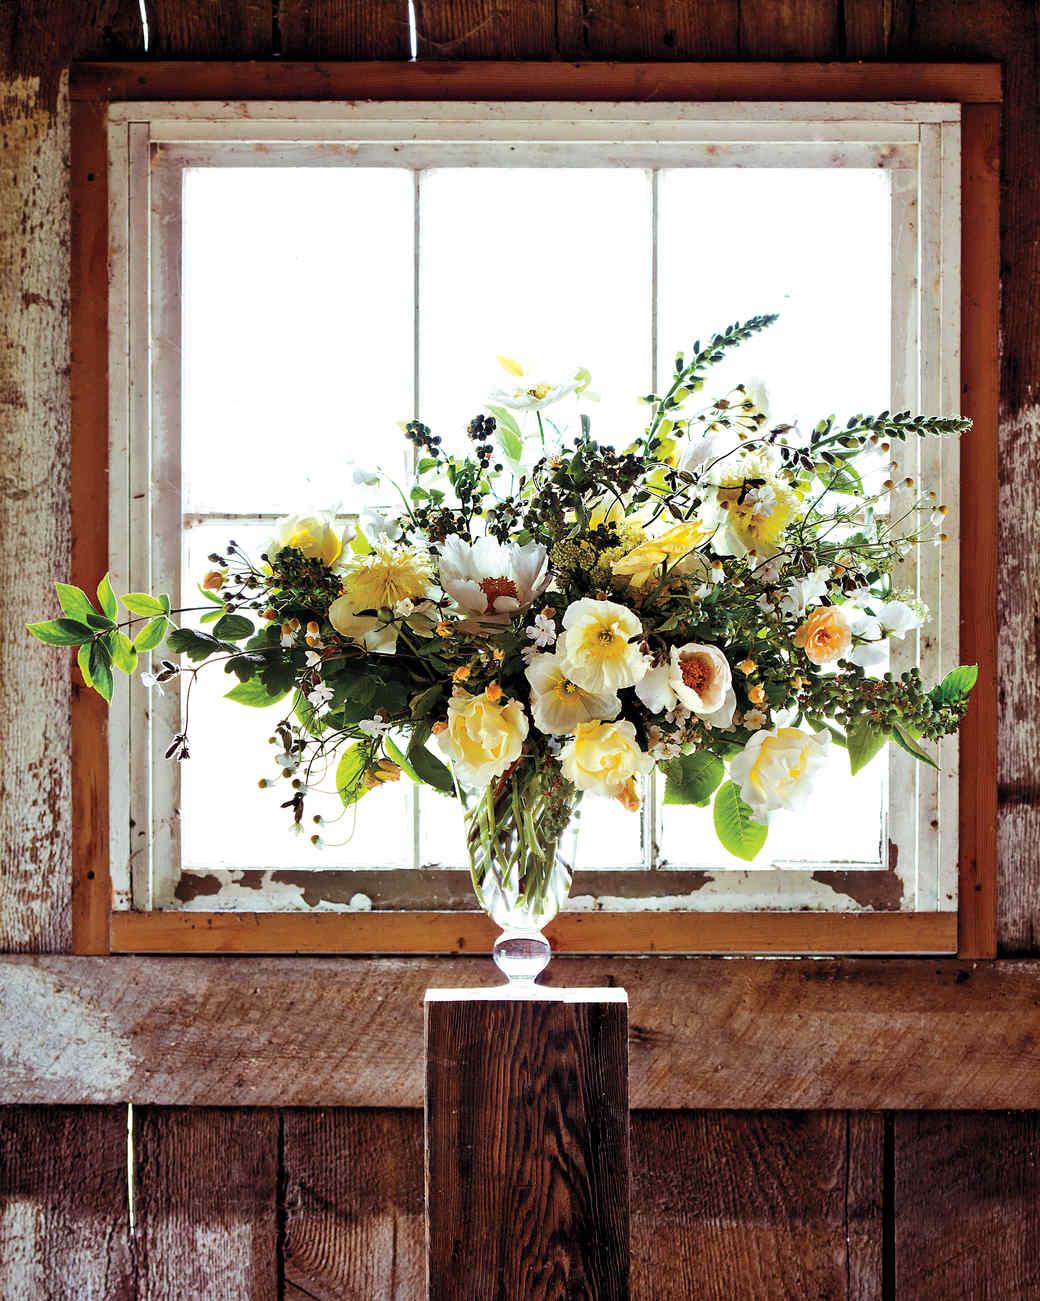 floret-flower-farm-193-edit-d111323.jpg